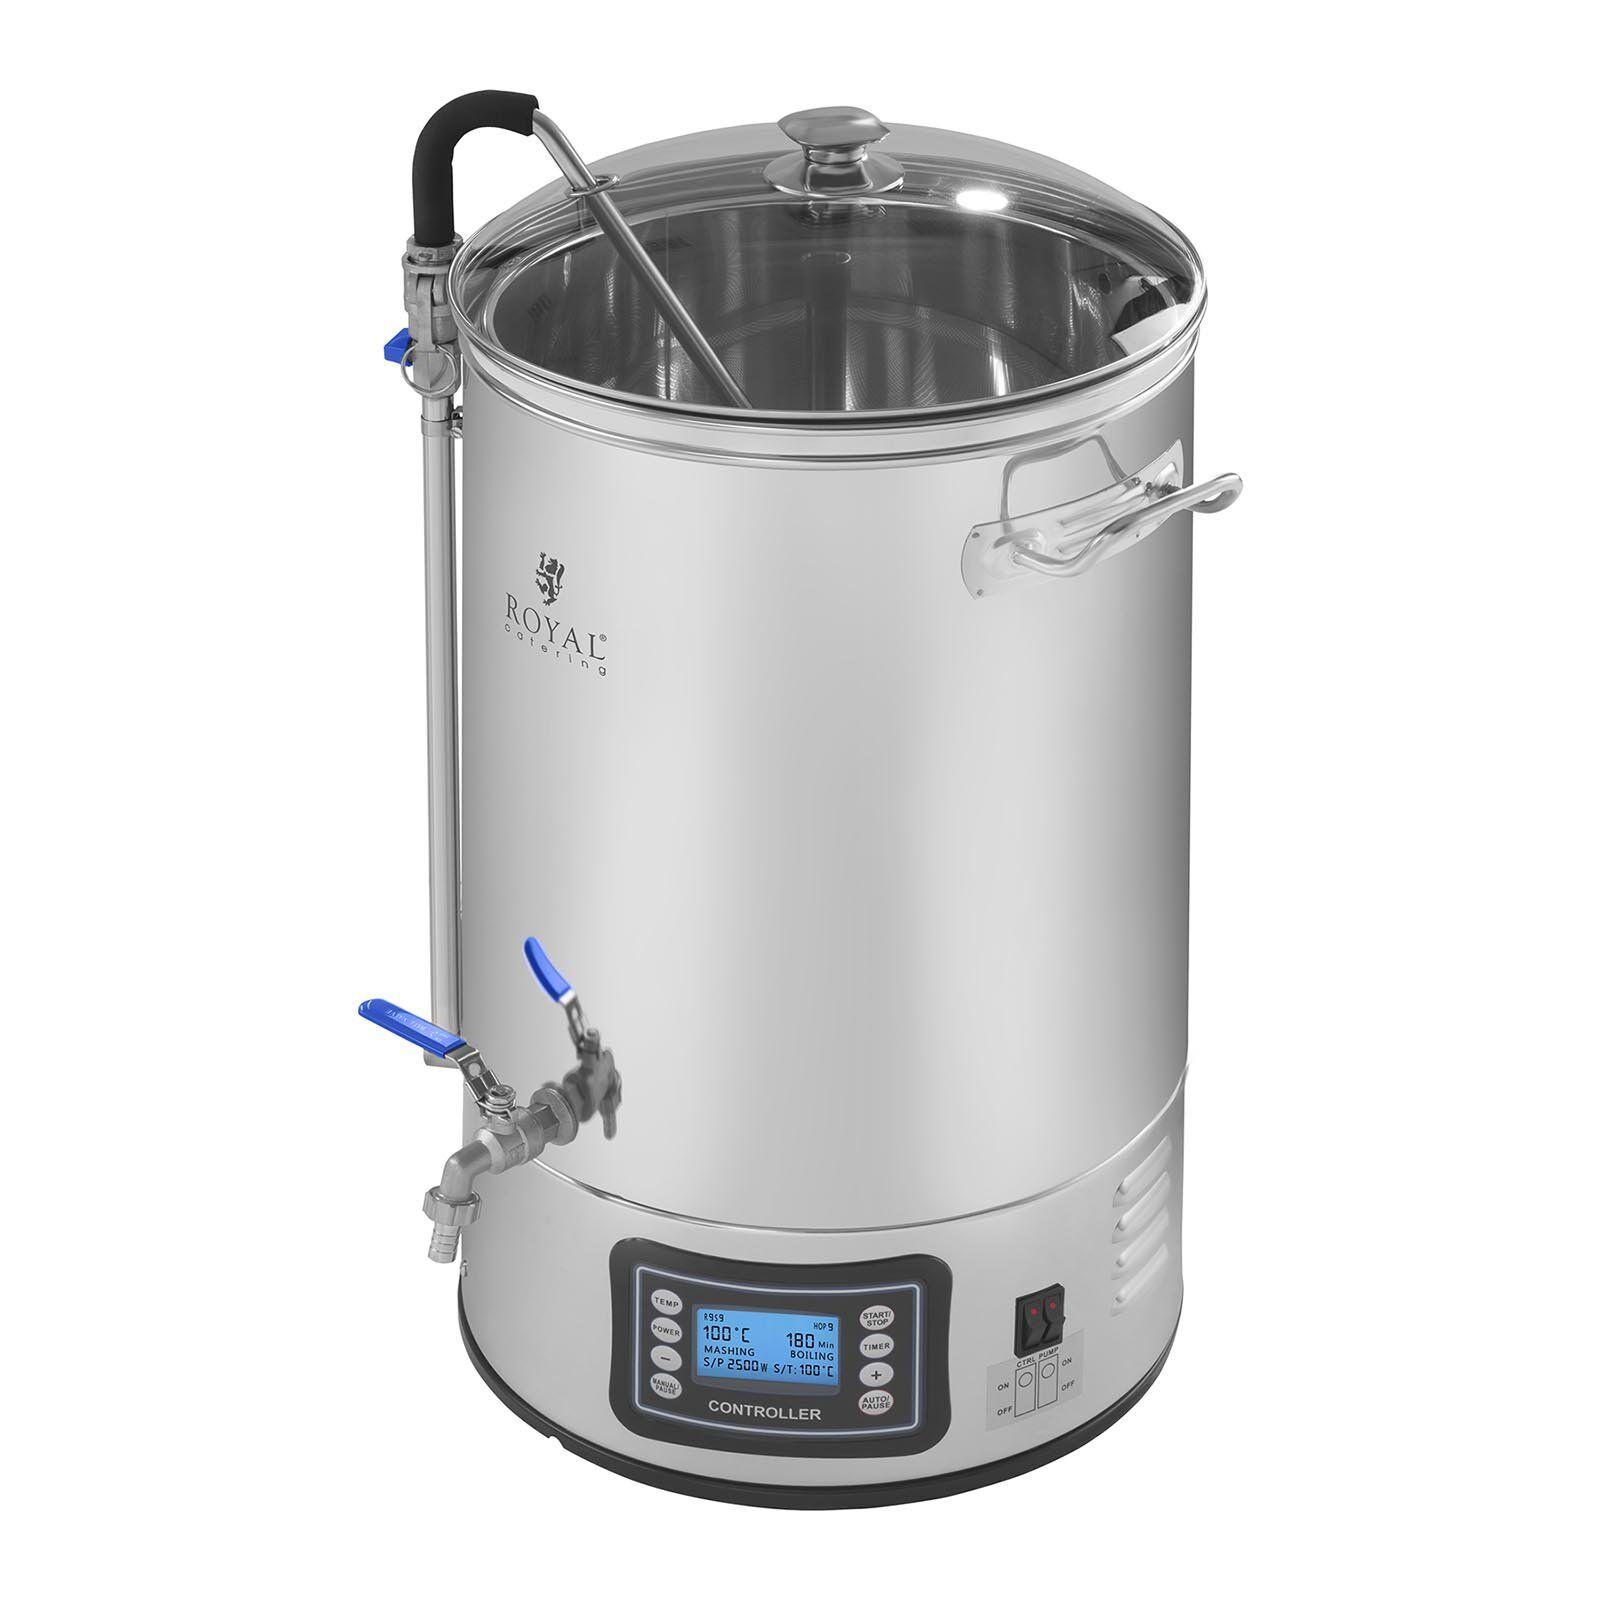 Royal Catering Bryggemaskin - 30 liter- 2,500 Watts